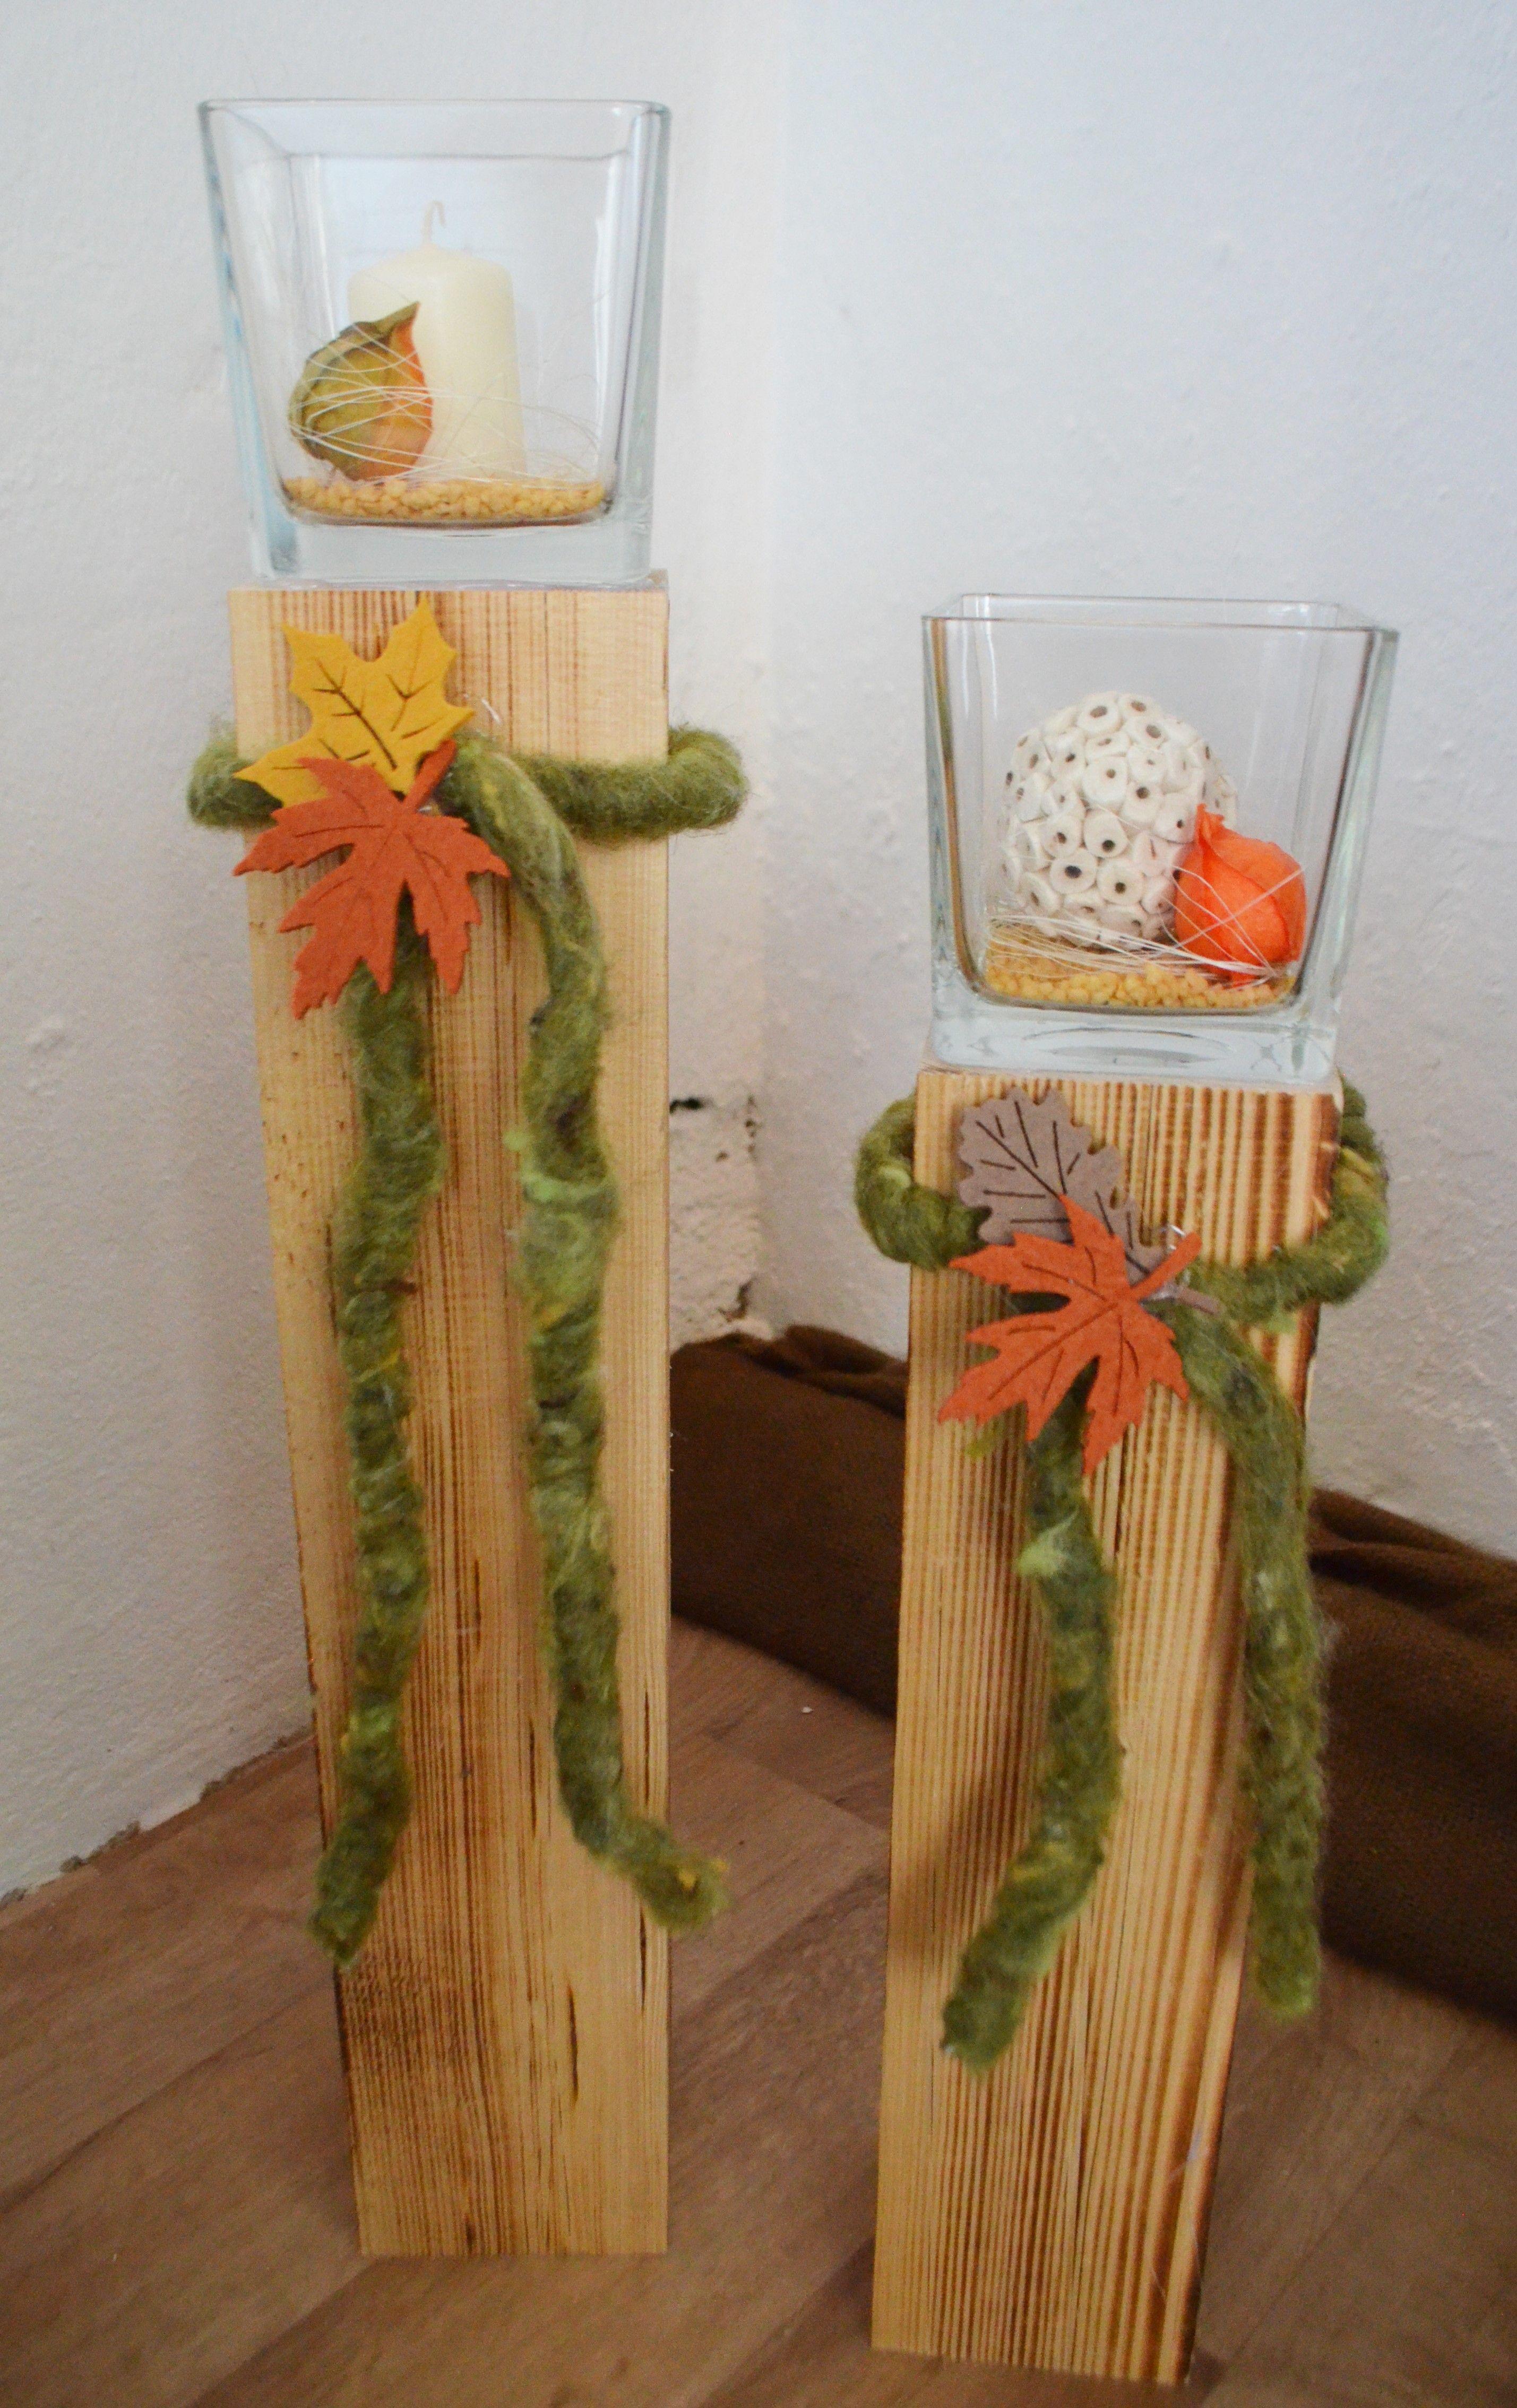 Altholz holz deko herbst natur pilz set stellen holzf chse herbst - Herbst tischdeko natur ...